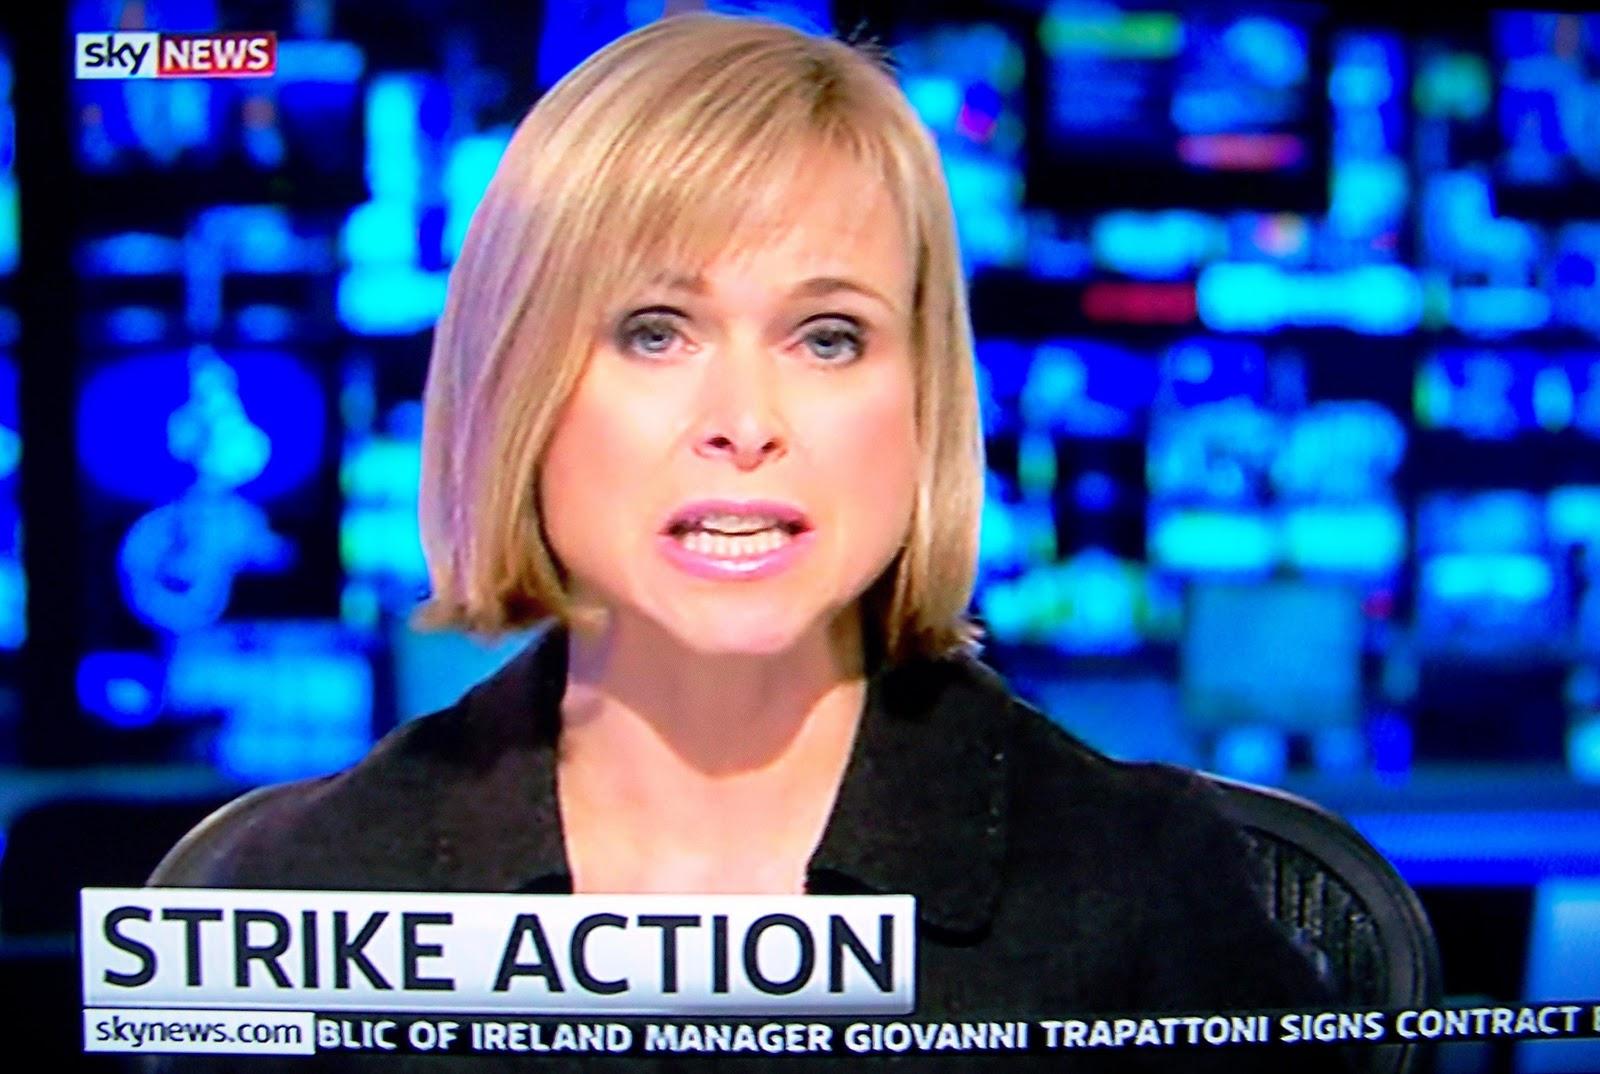 Sky News - YouTube